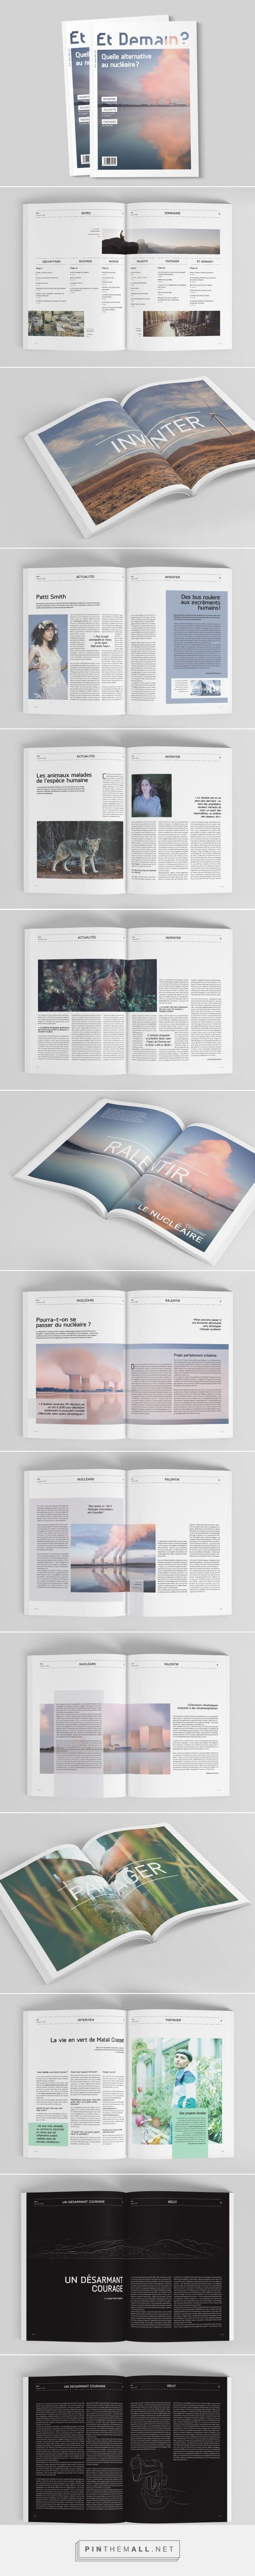 édition Et Demain Magazine on Behance a grouped images picture Pin Them…